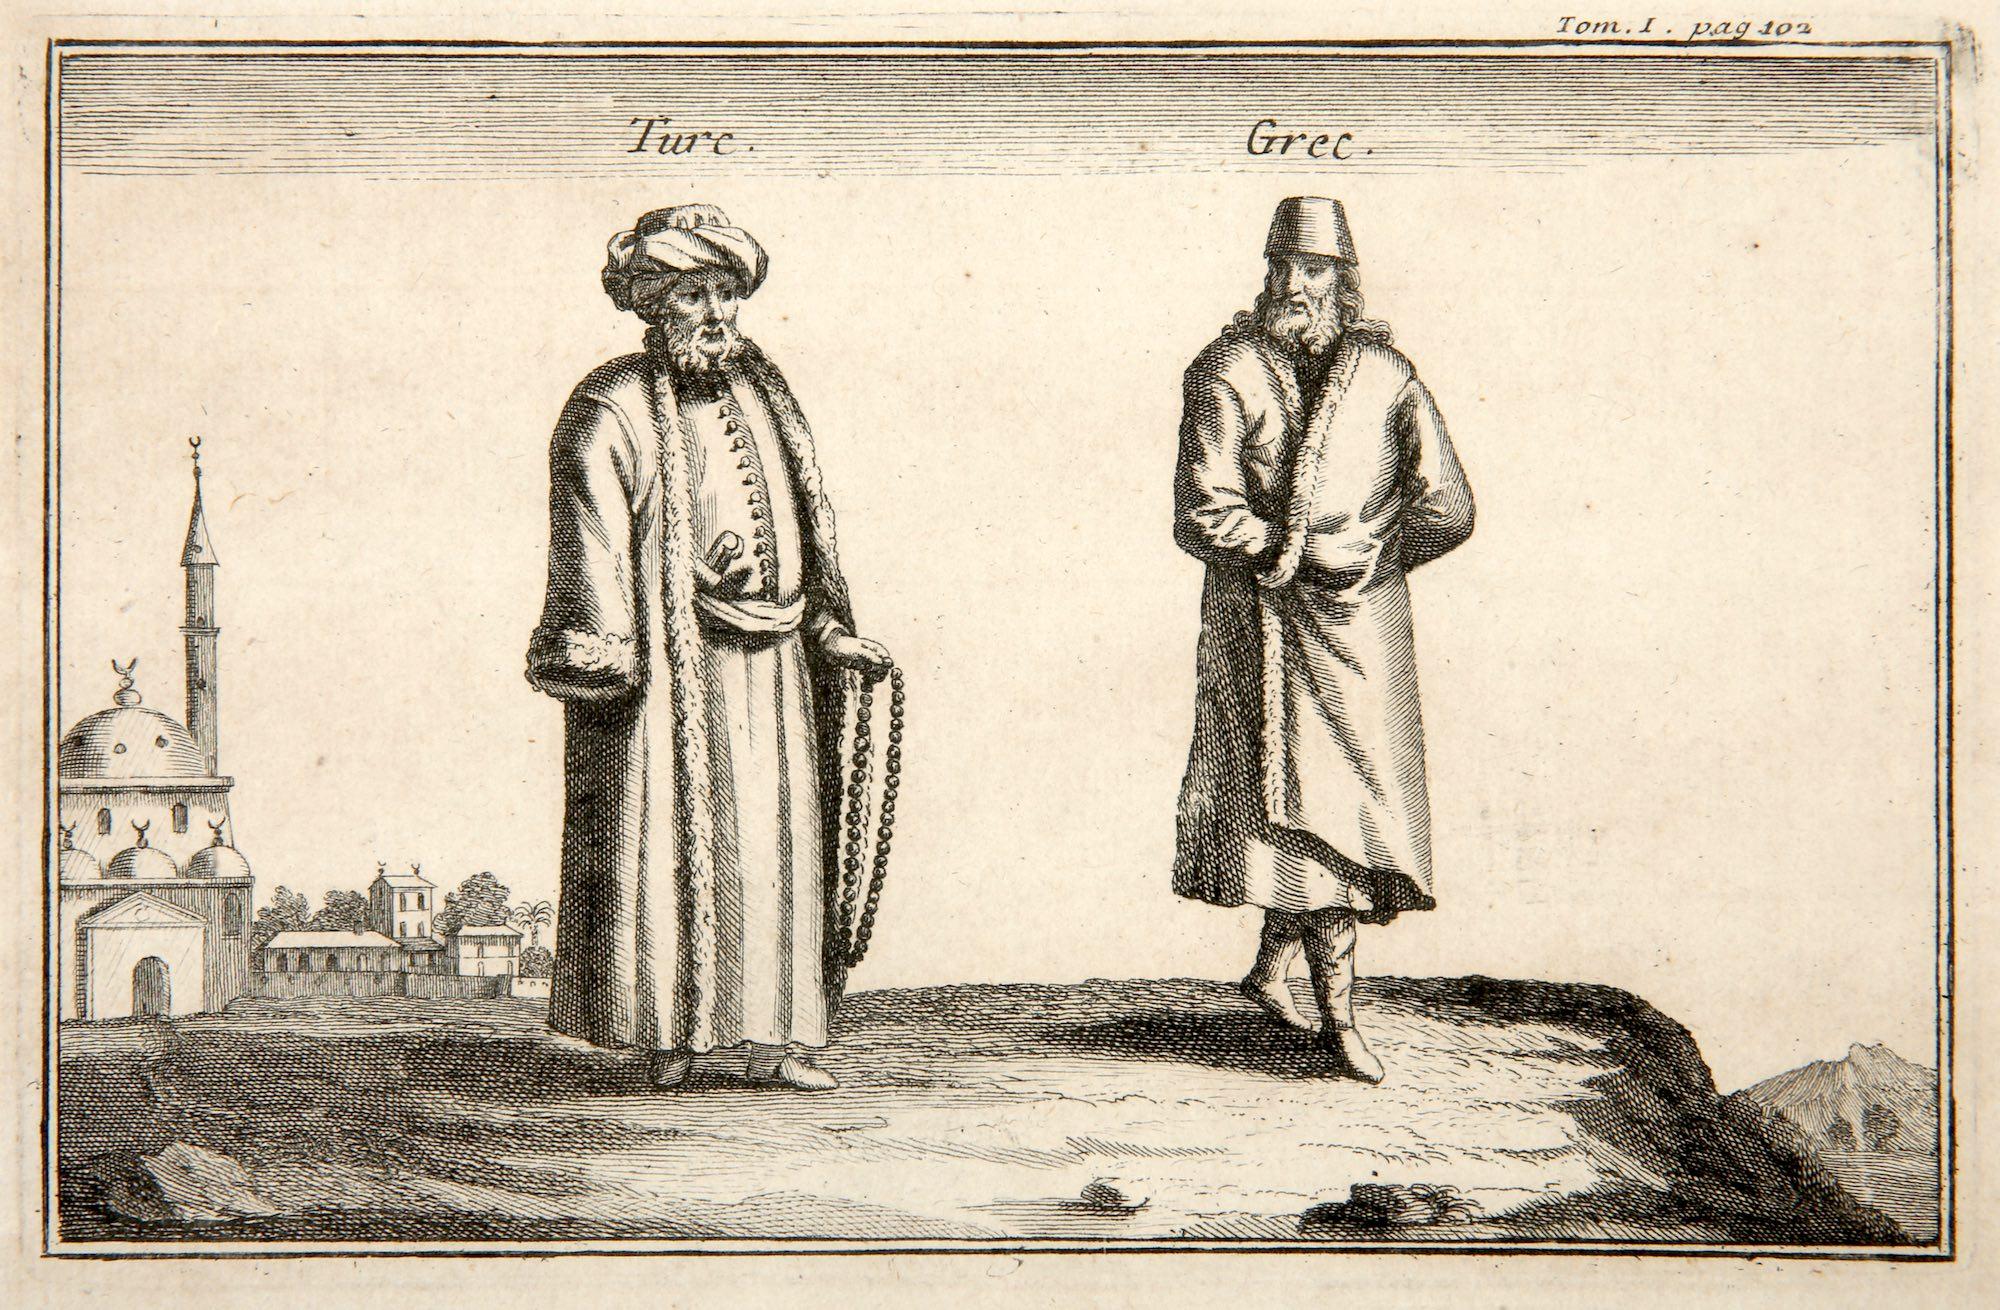 Joseph Pitton de Tournefort   Turc, Grec